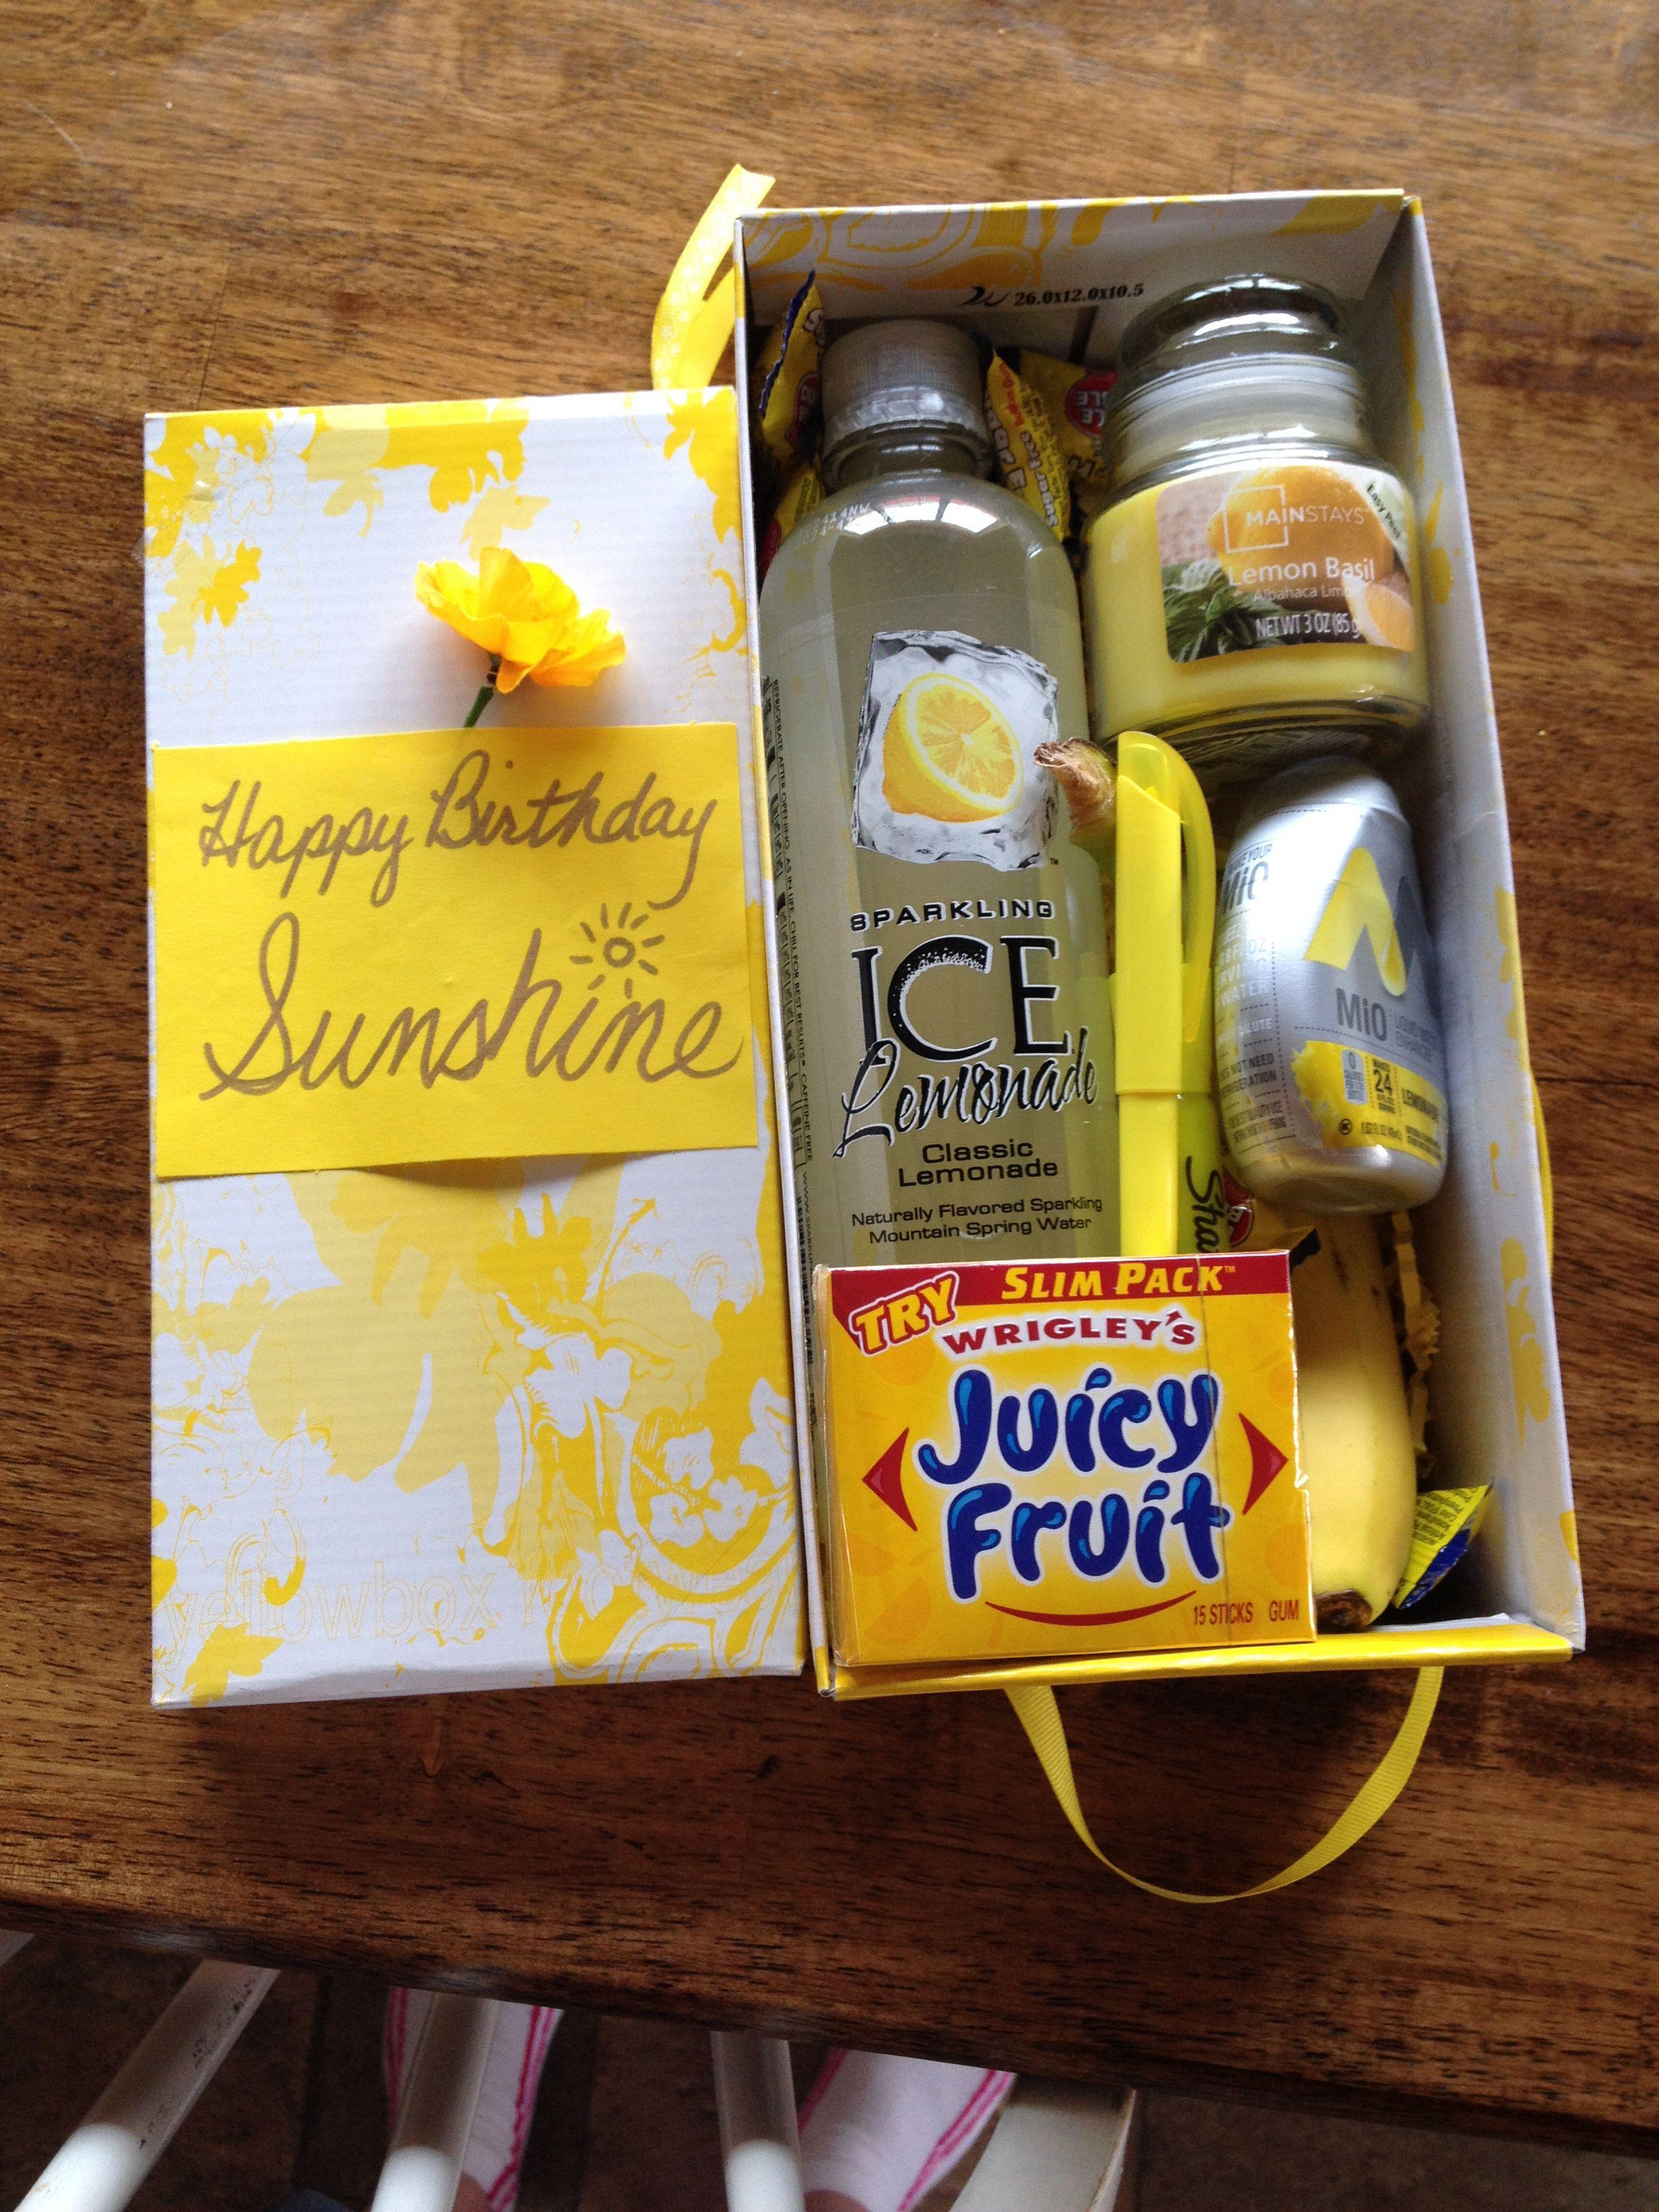 Sunshine in a box. Friend birthday gifts, Sunshine gift